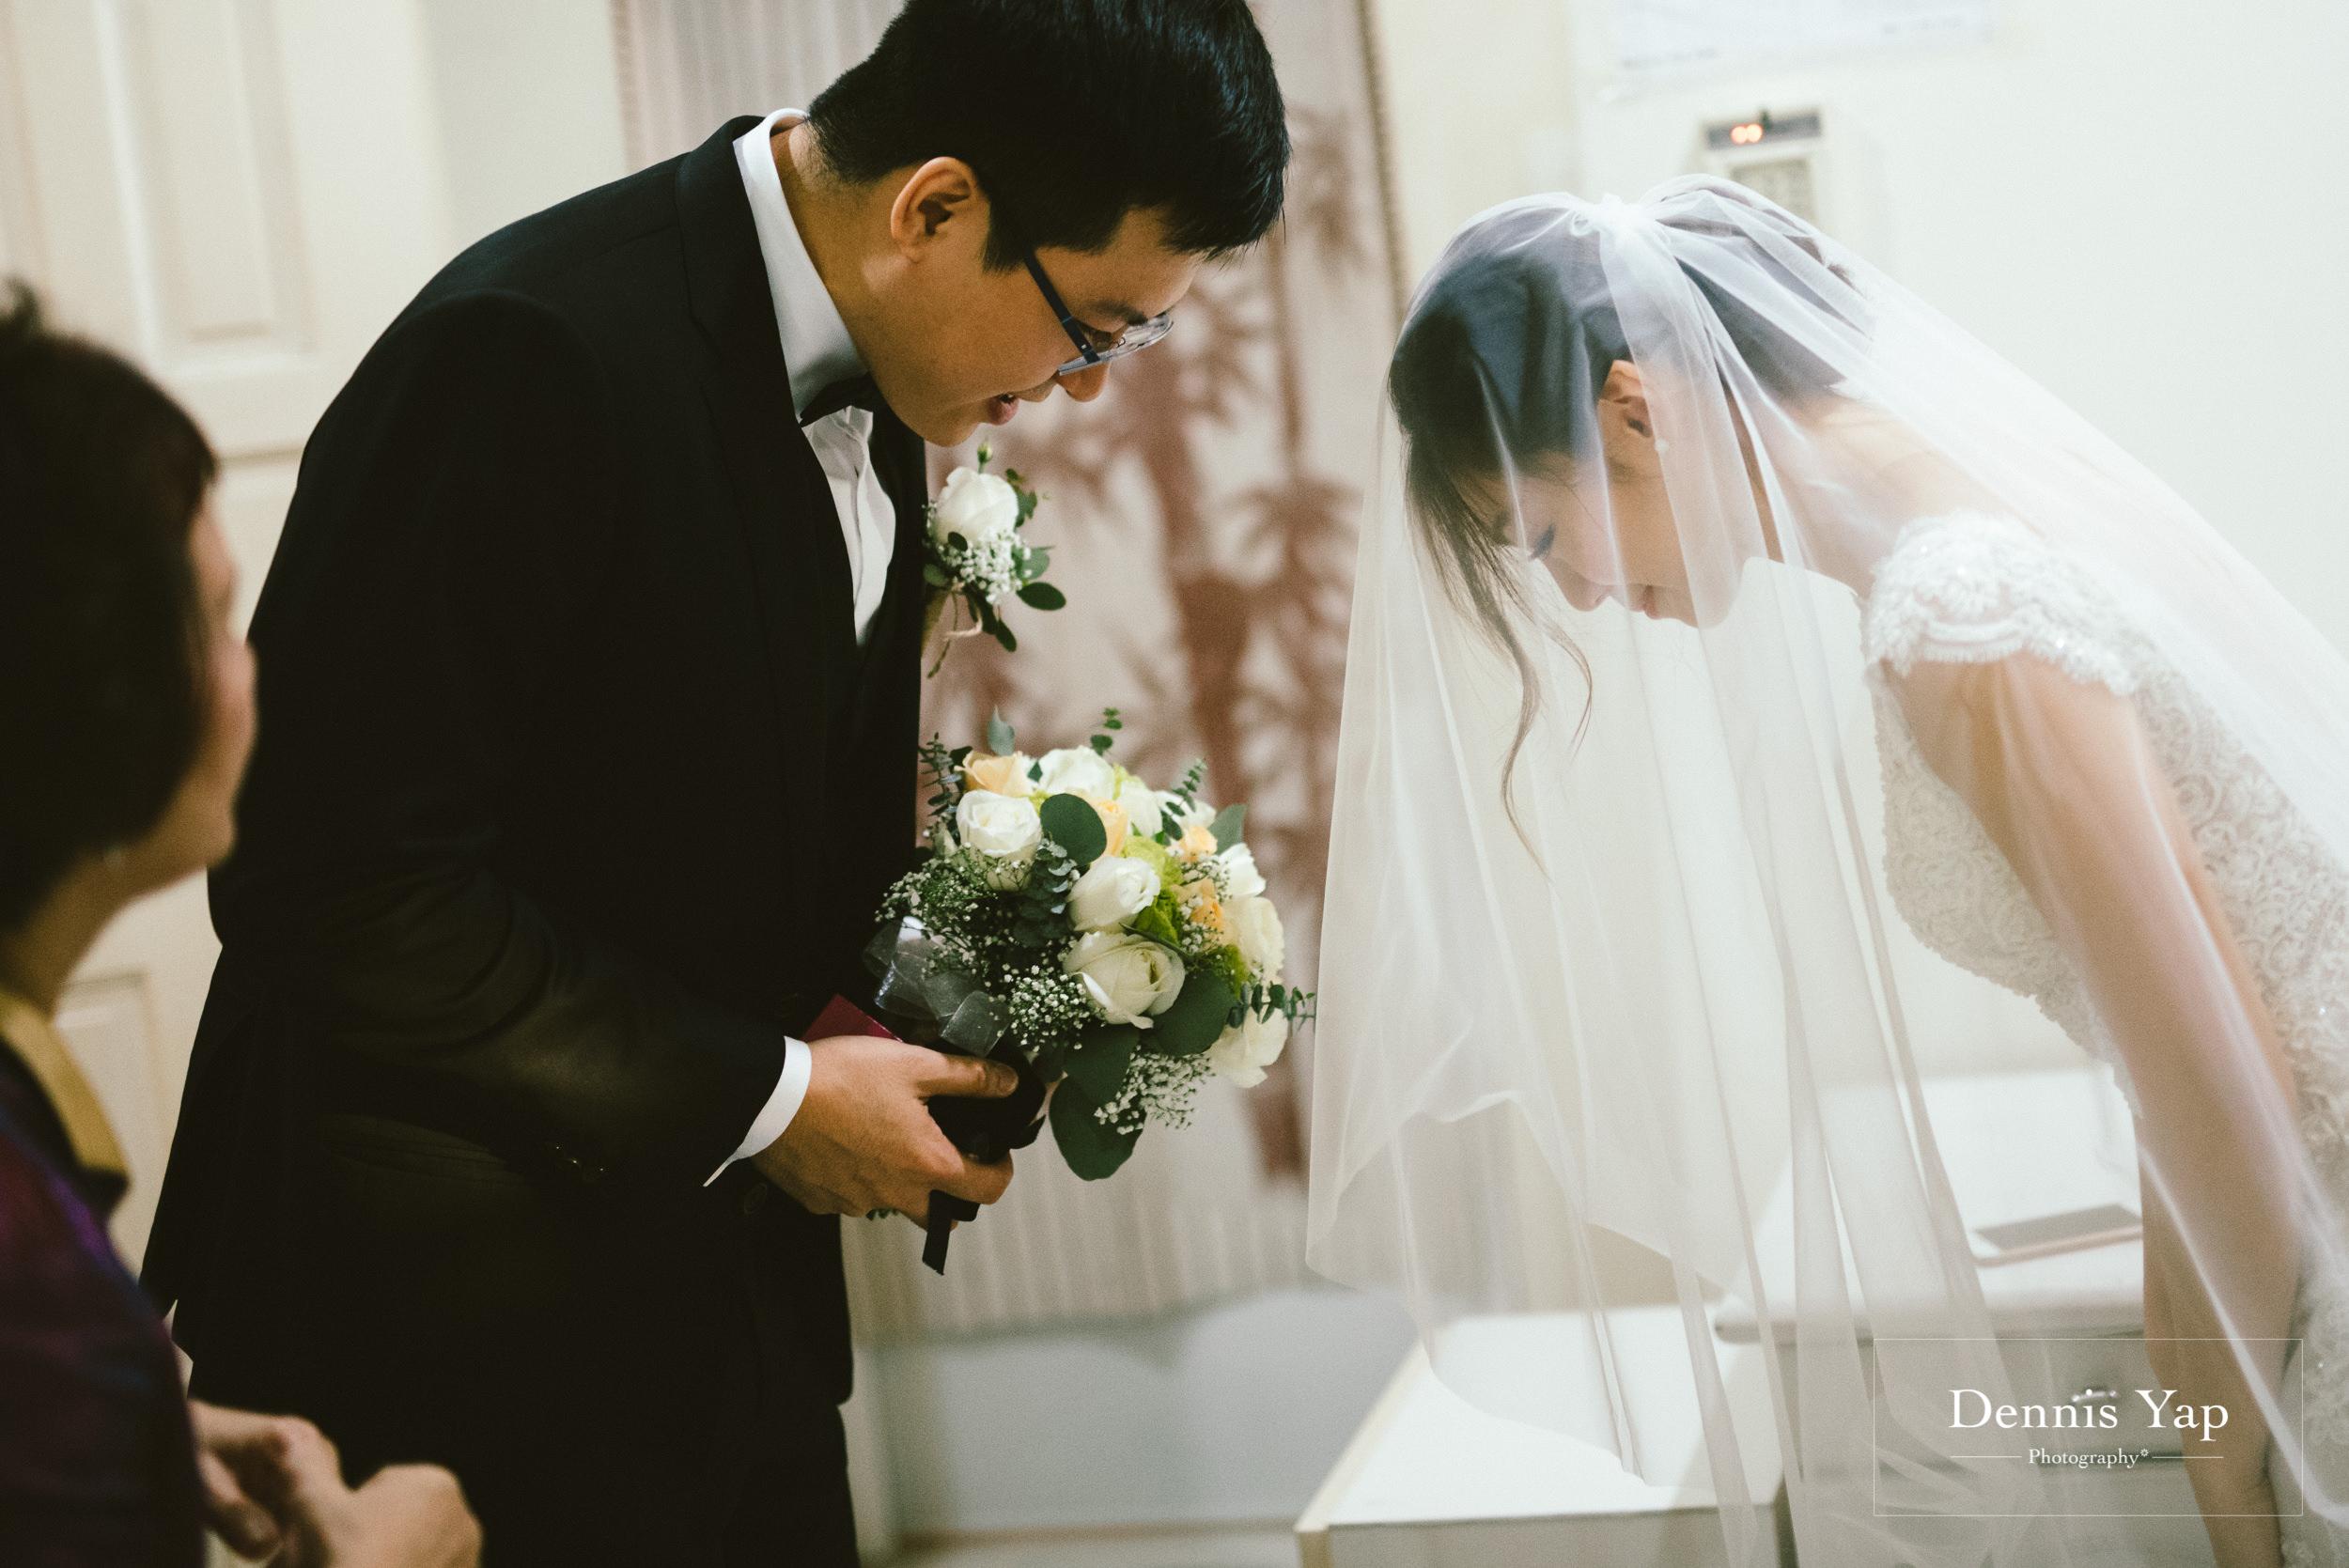 chuan wai angela wedding day bukit jelutong selangor malaysia dennis yap photography-3.jpg